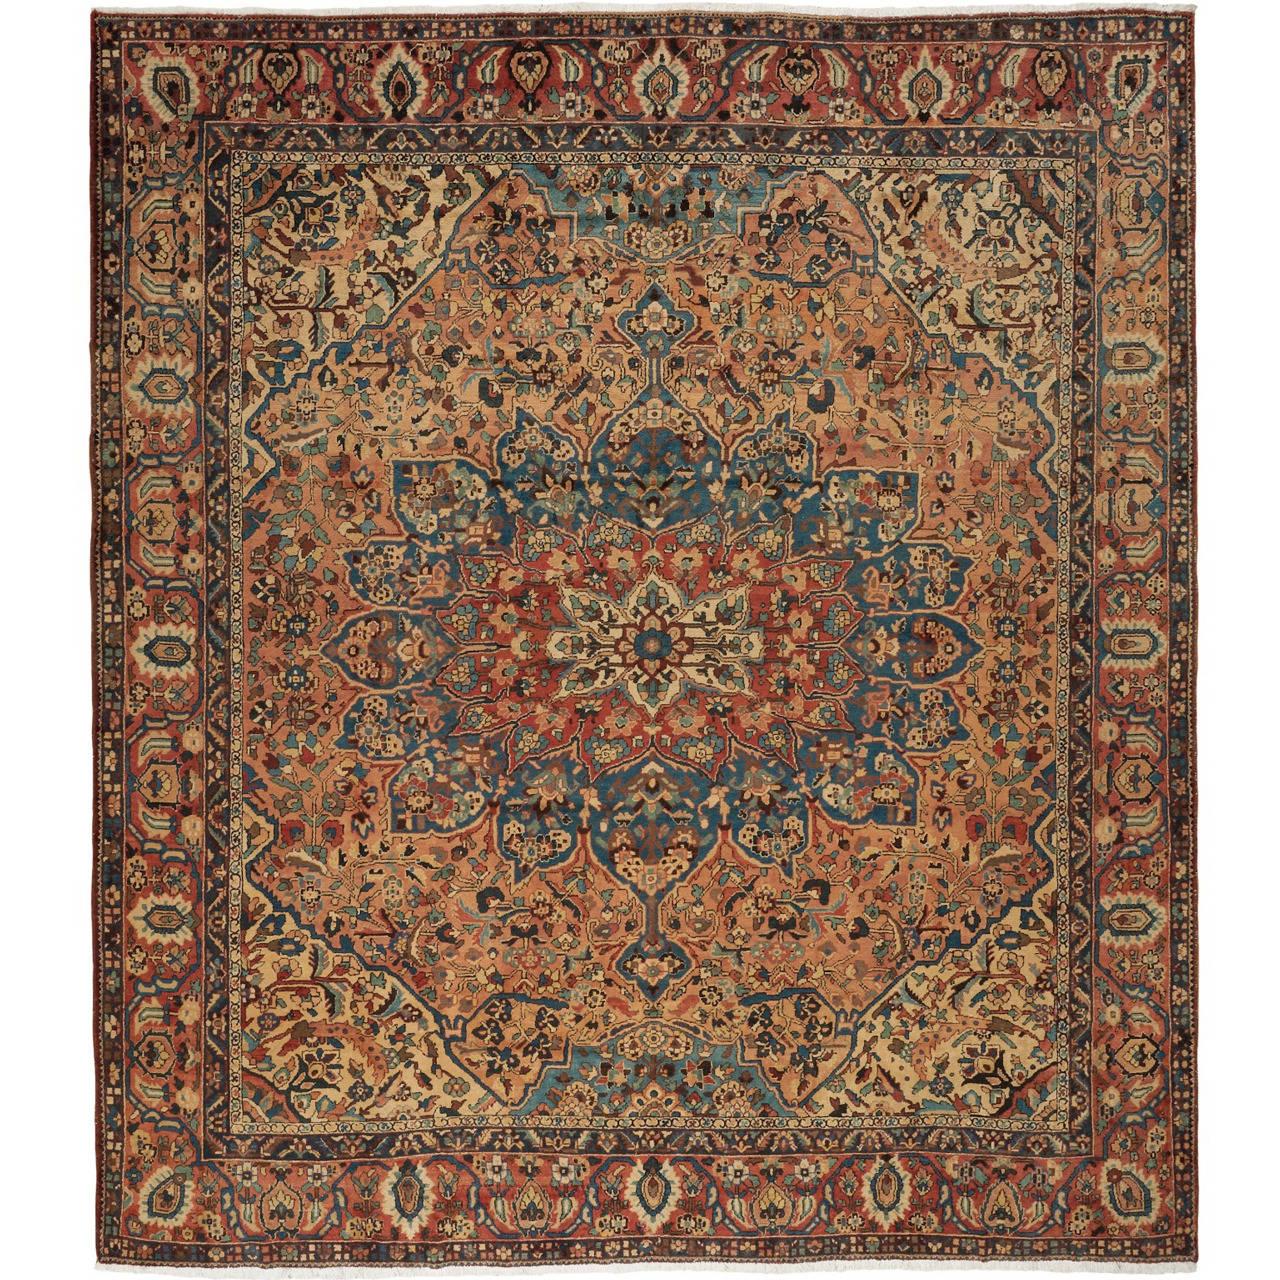 Oversize Antique Bakhtiari Carpet 1